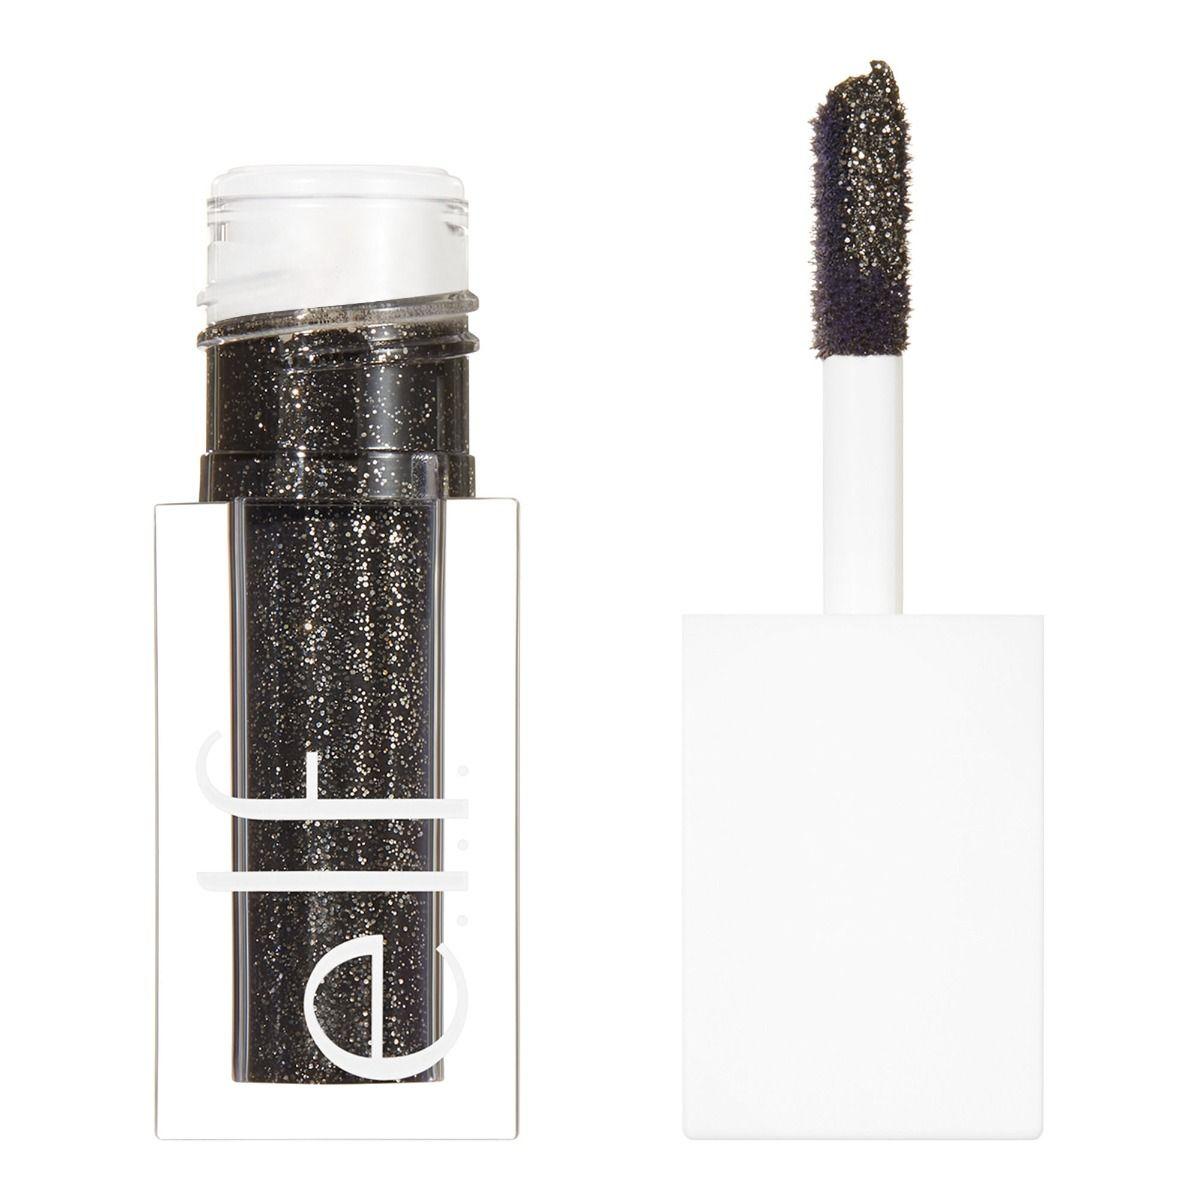 e.l.f. Glitter Melt Liquid Eyeshadow Black Magic